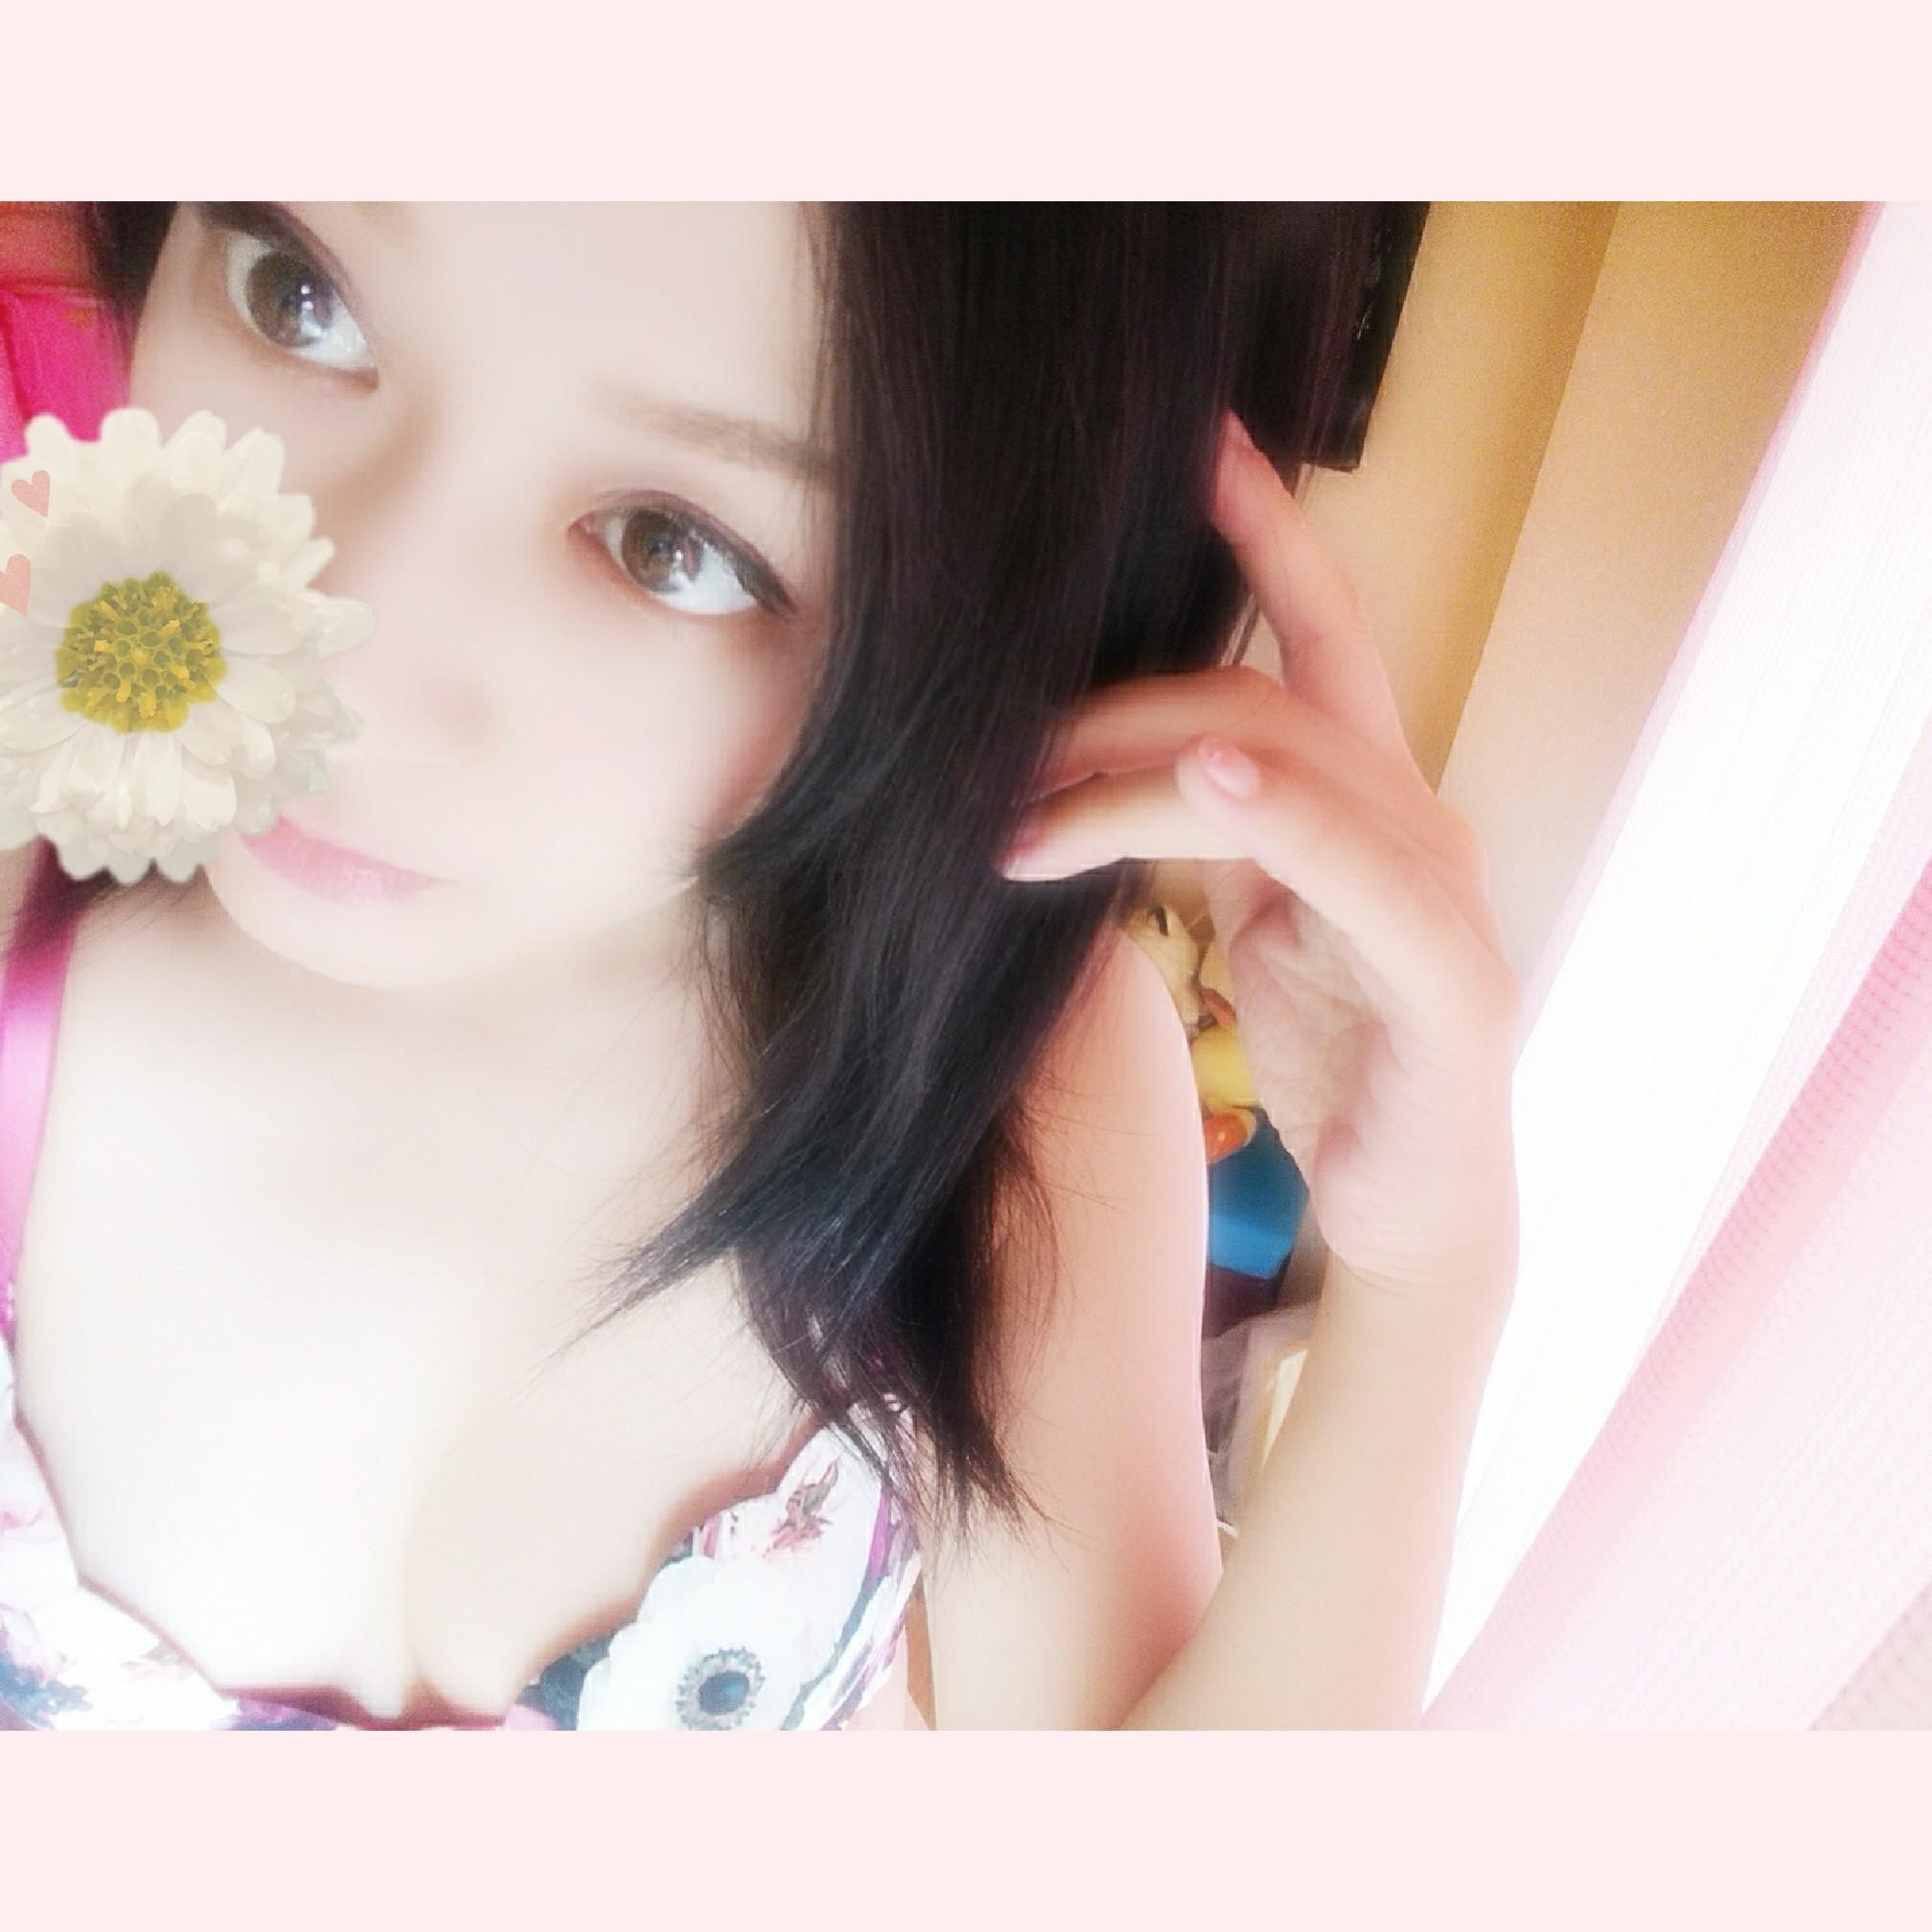 「morning」09/12(木) 09:21 | るなの写メ・風俗動画